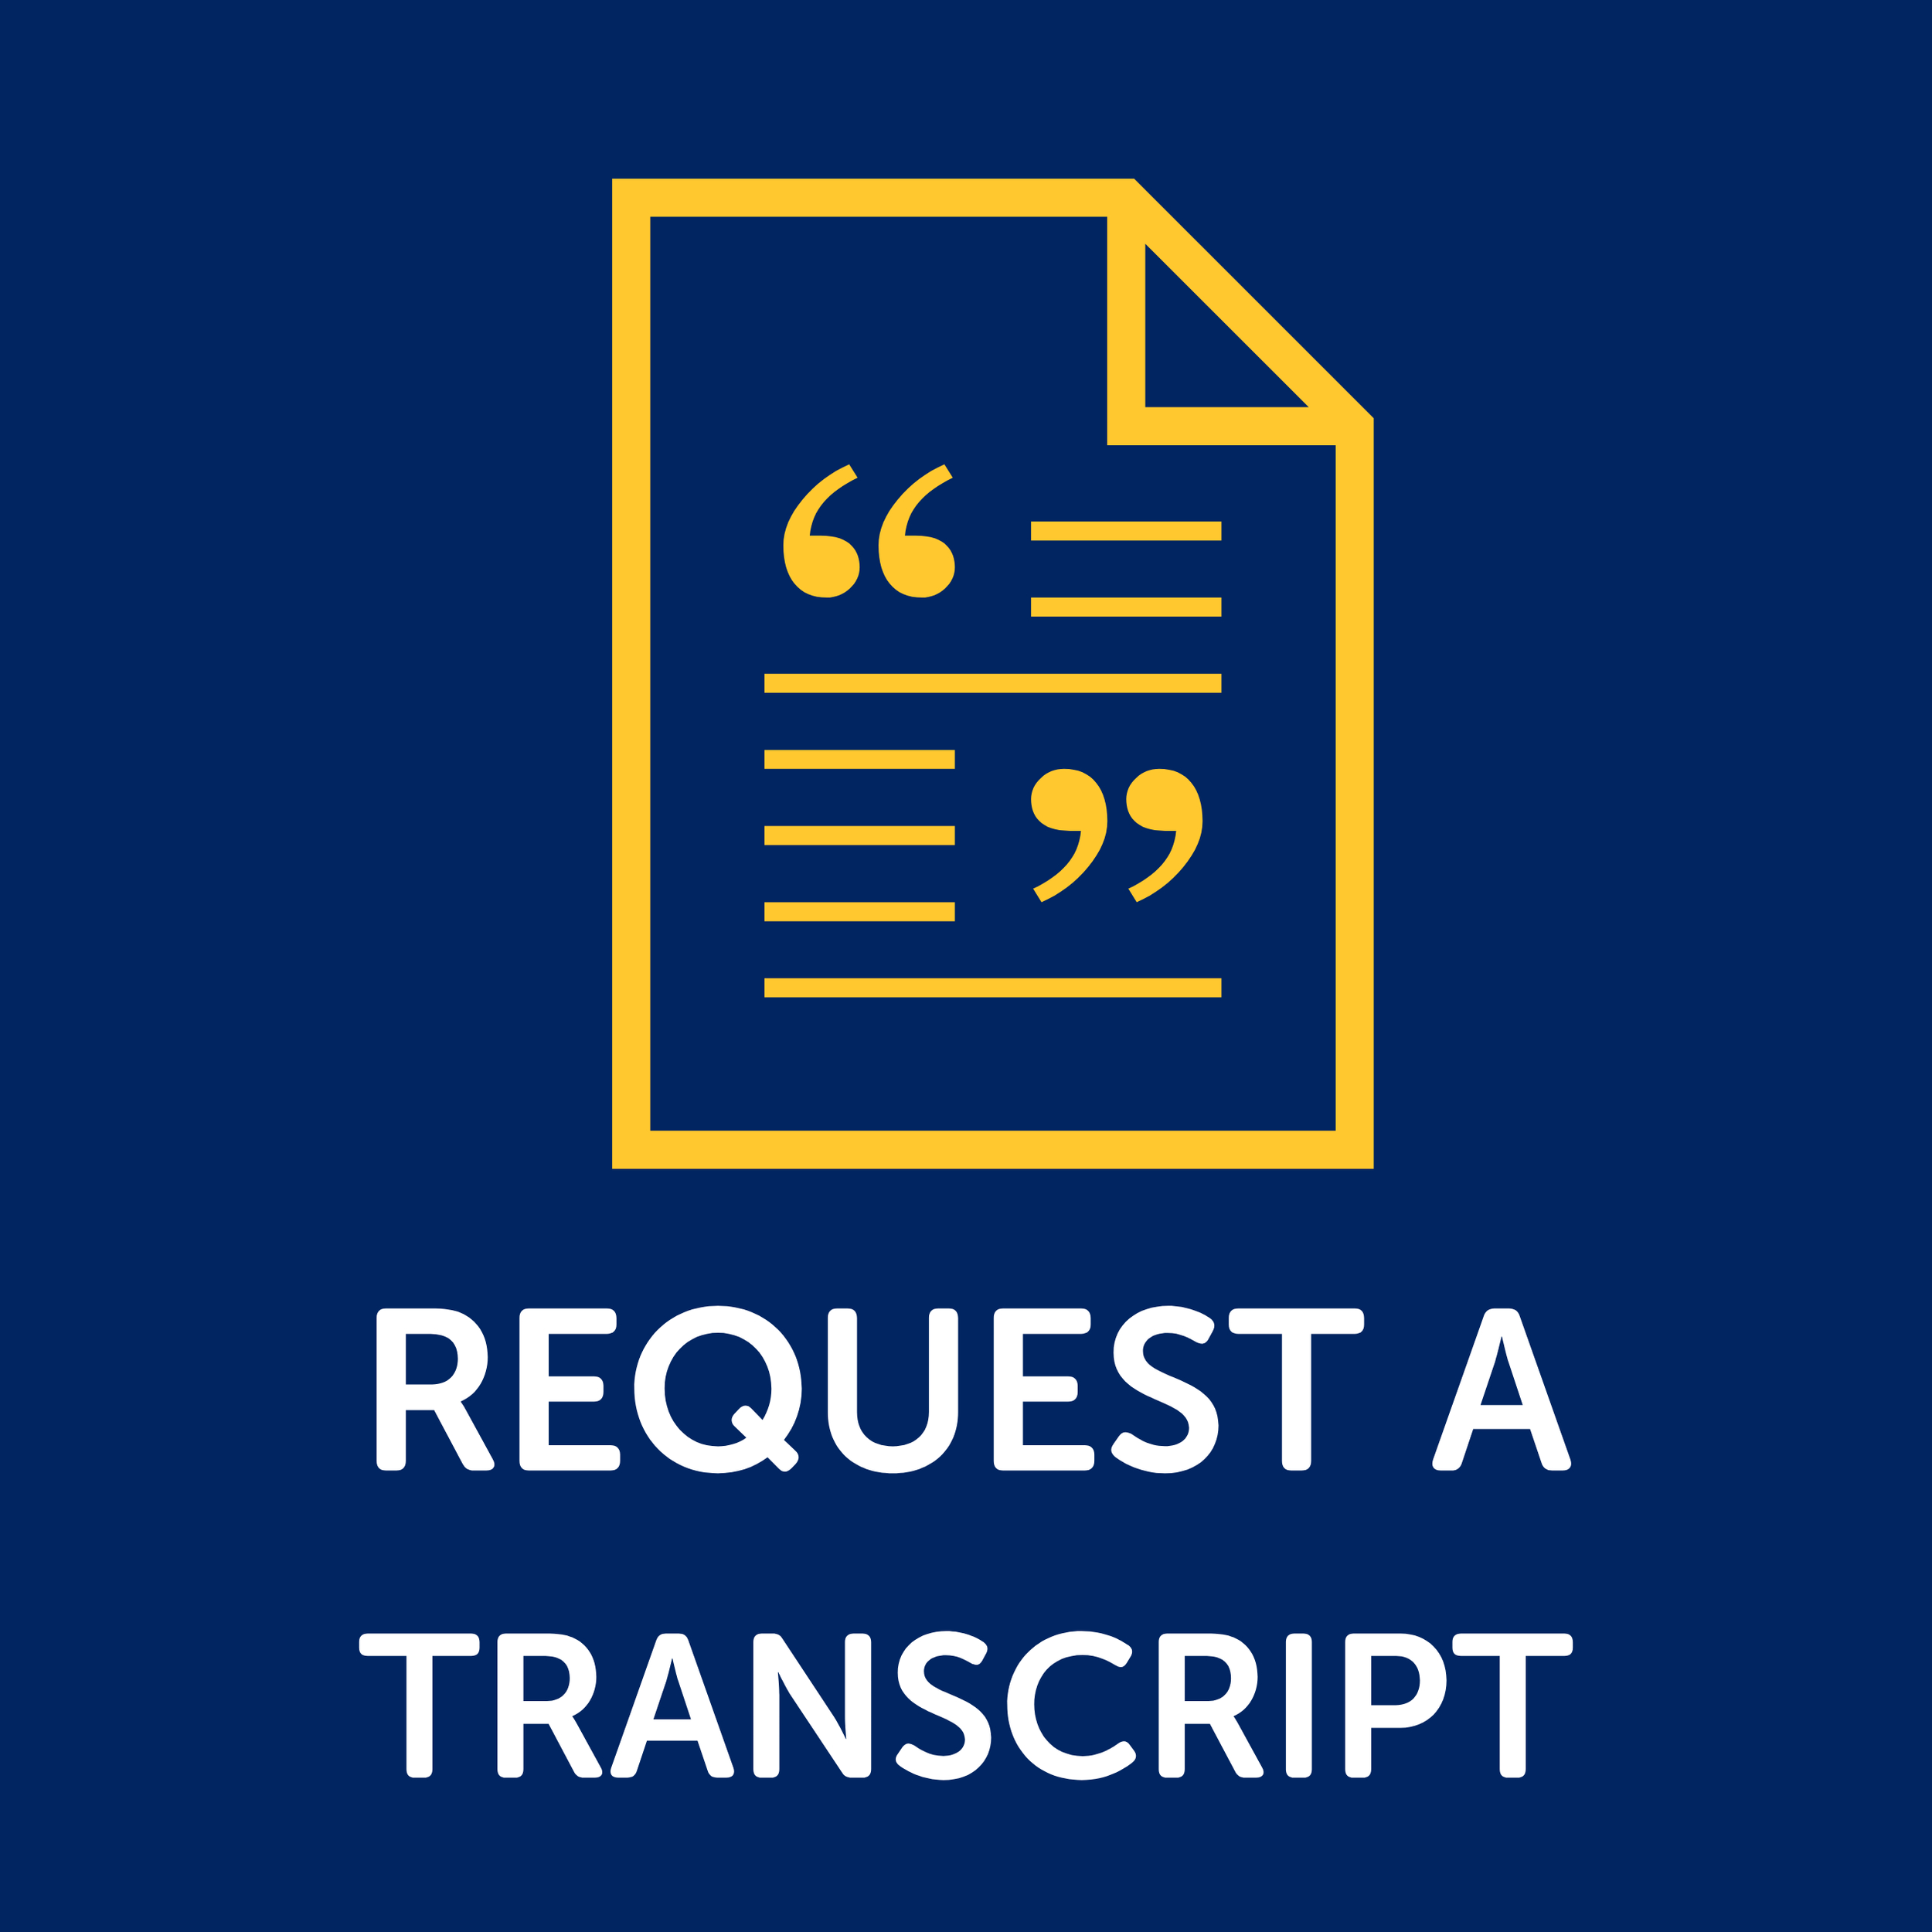 Button to request a transcript.